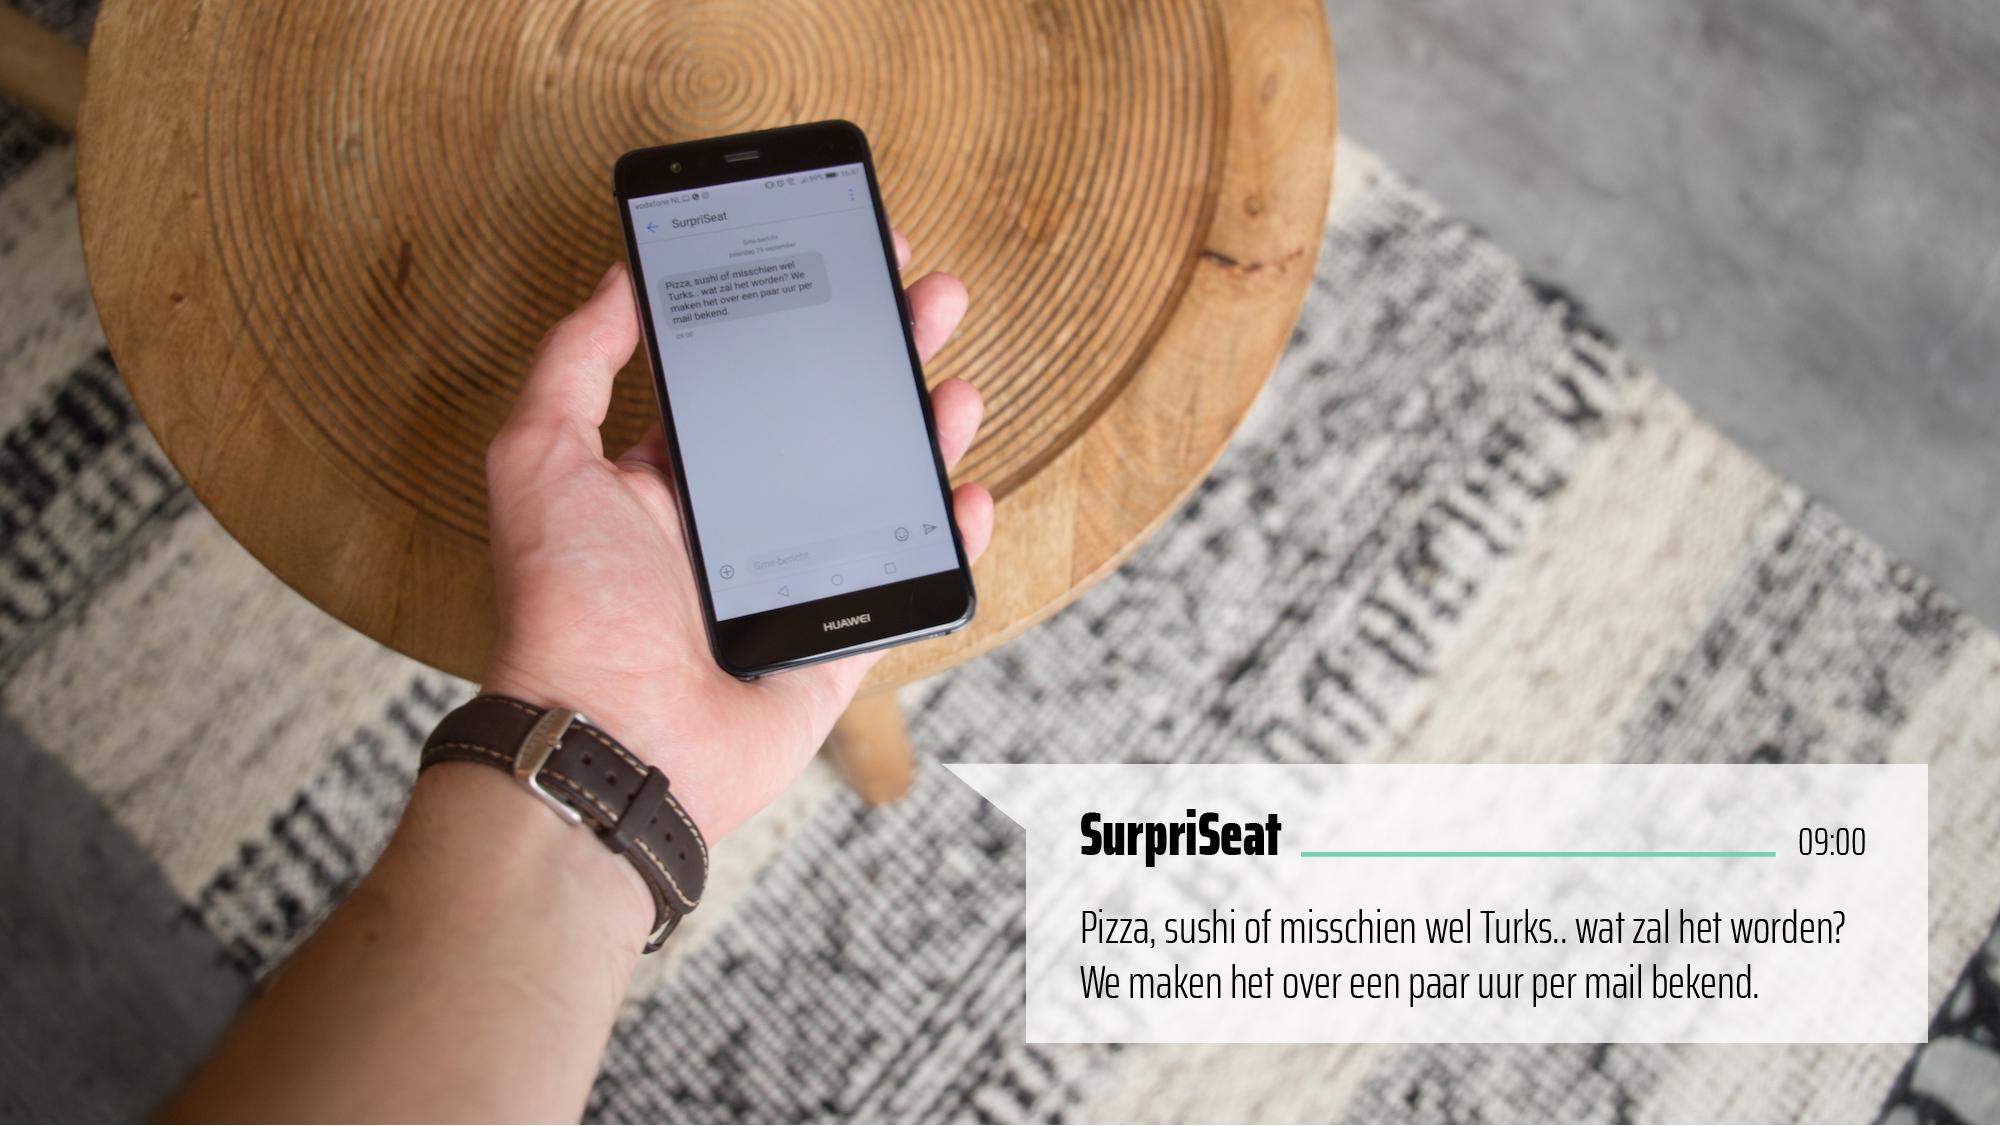 SurpriSeat-SMS